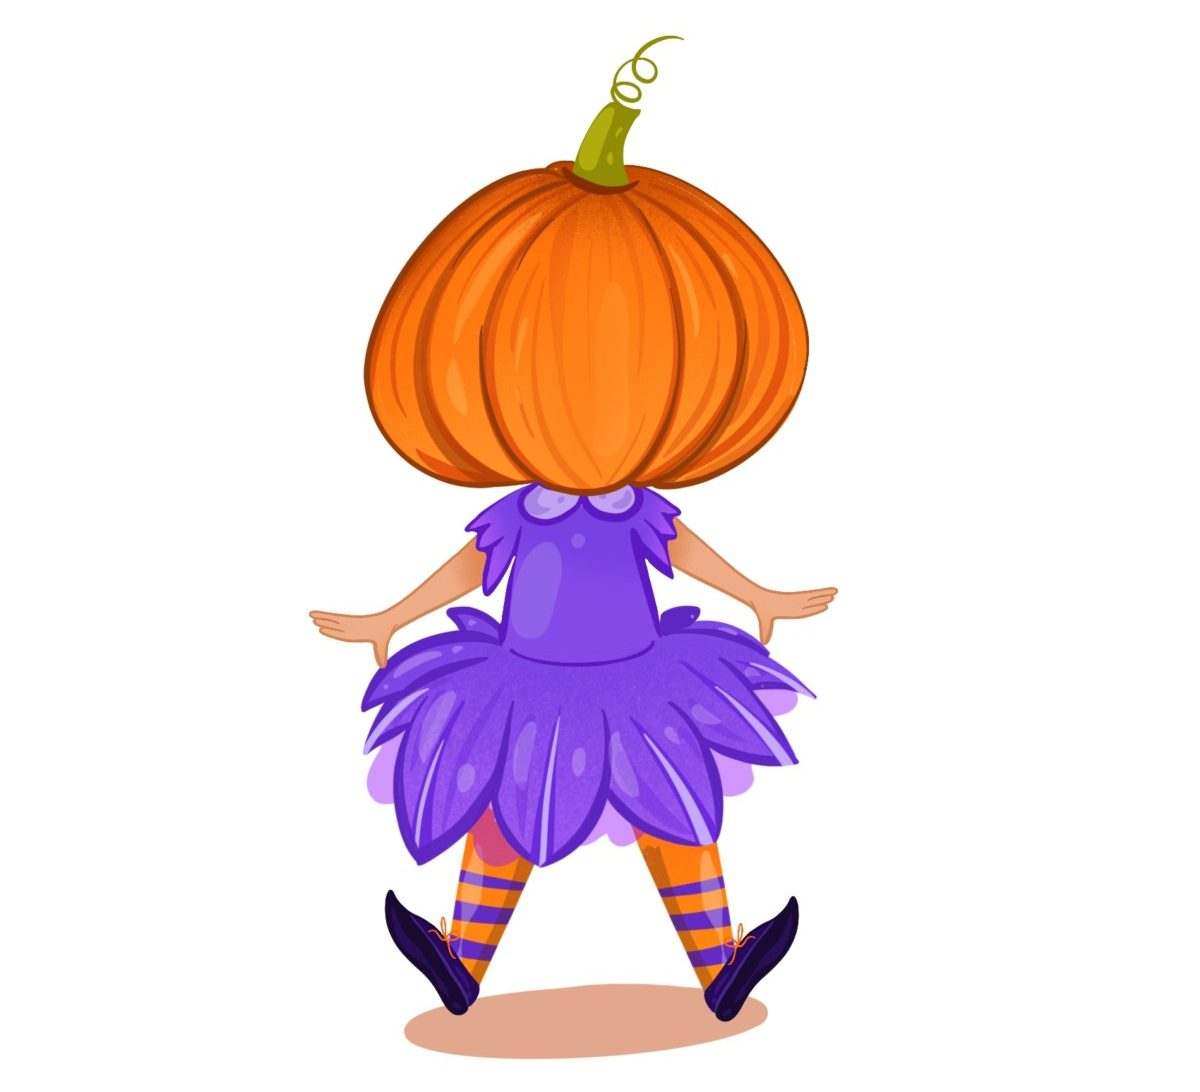 Penny with pumpkin head